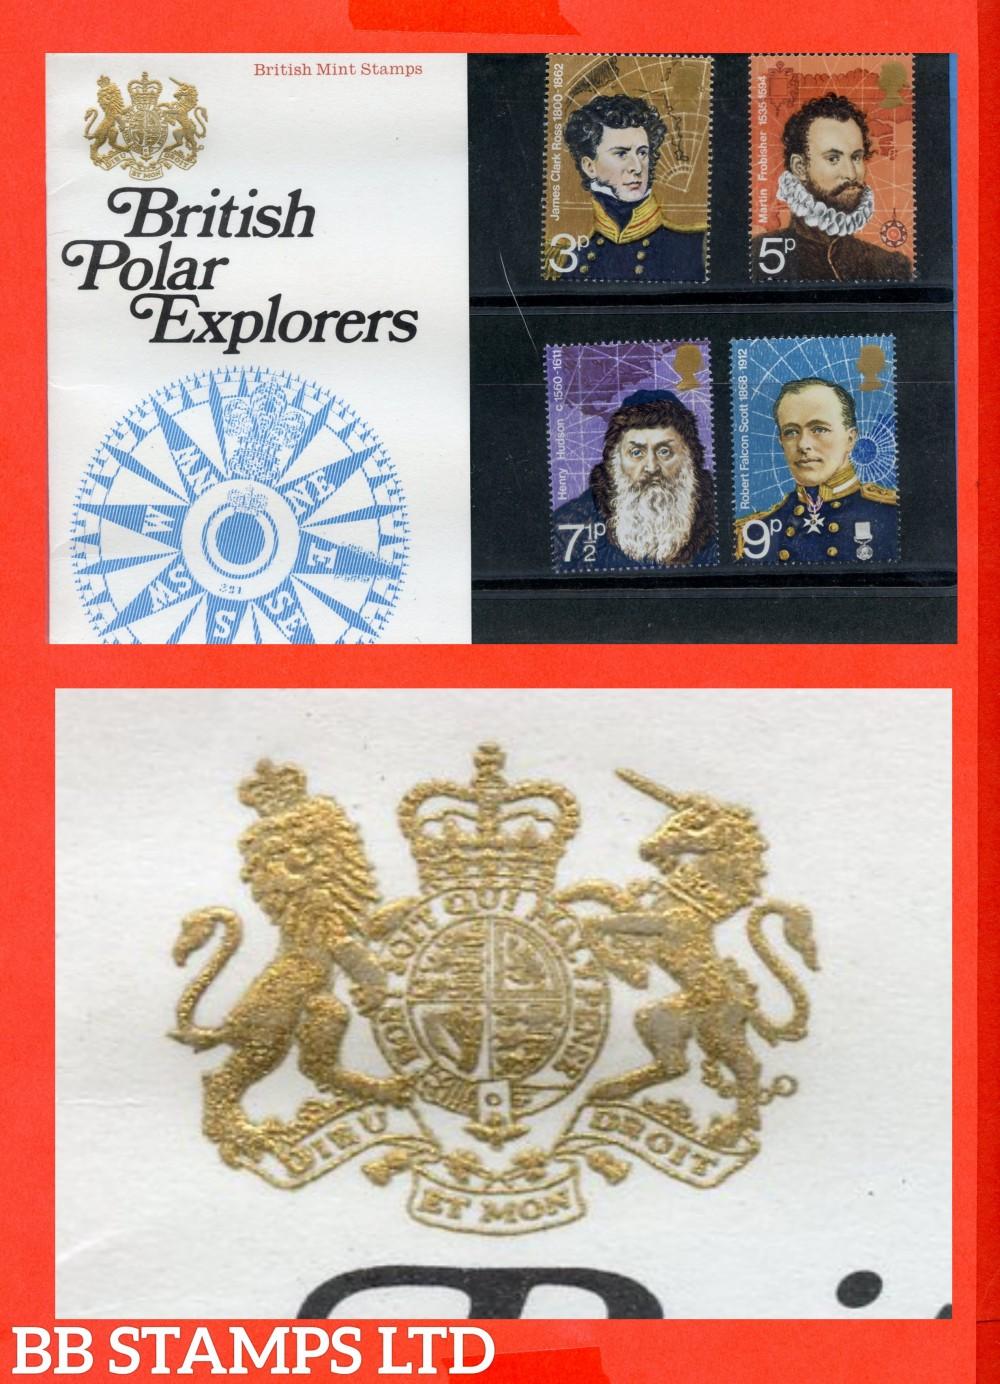 1972 British Polar Explorers Pres Pack.  (Pack is Type C  = Decorative Crown, Flower Visible Between Unicorn's Legs)